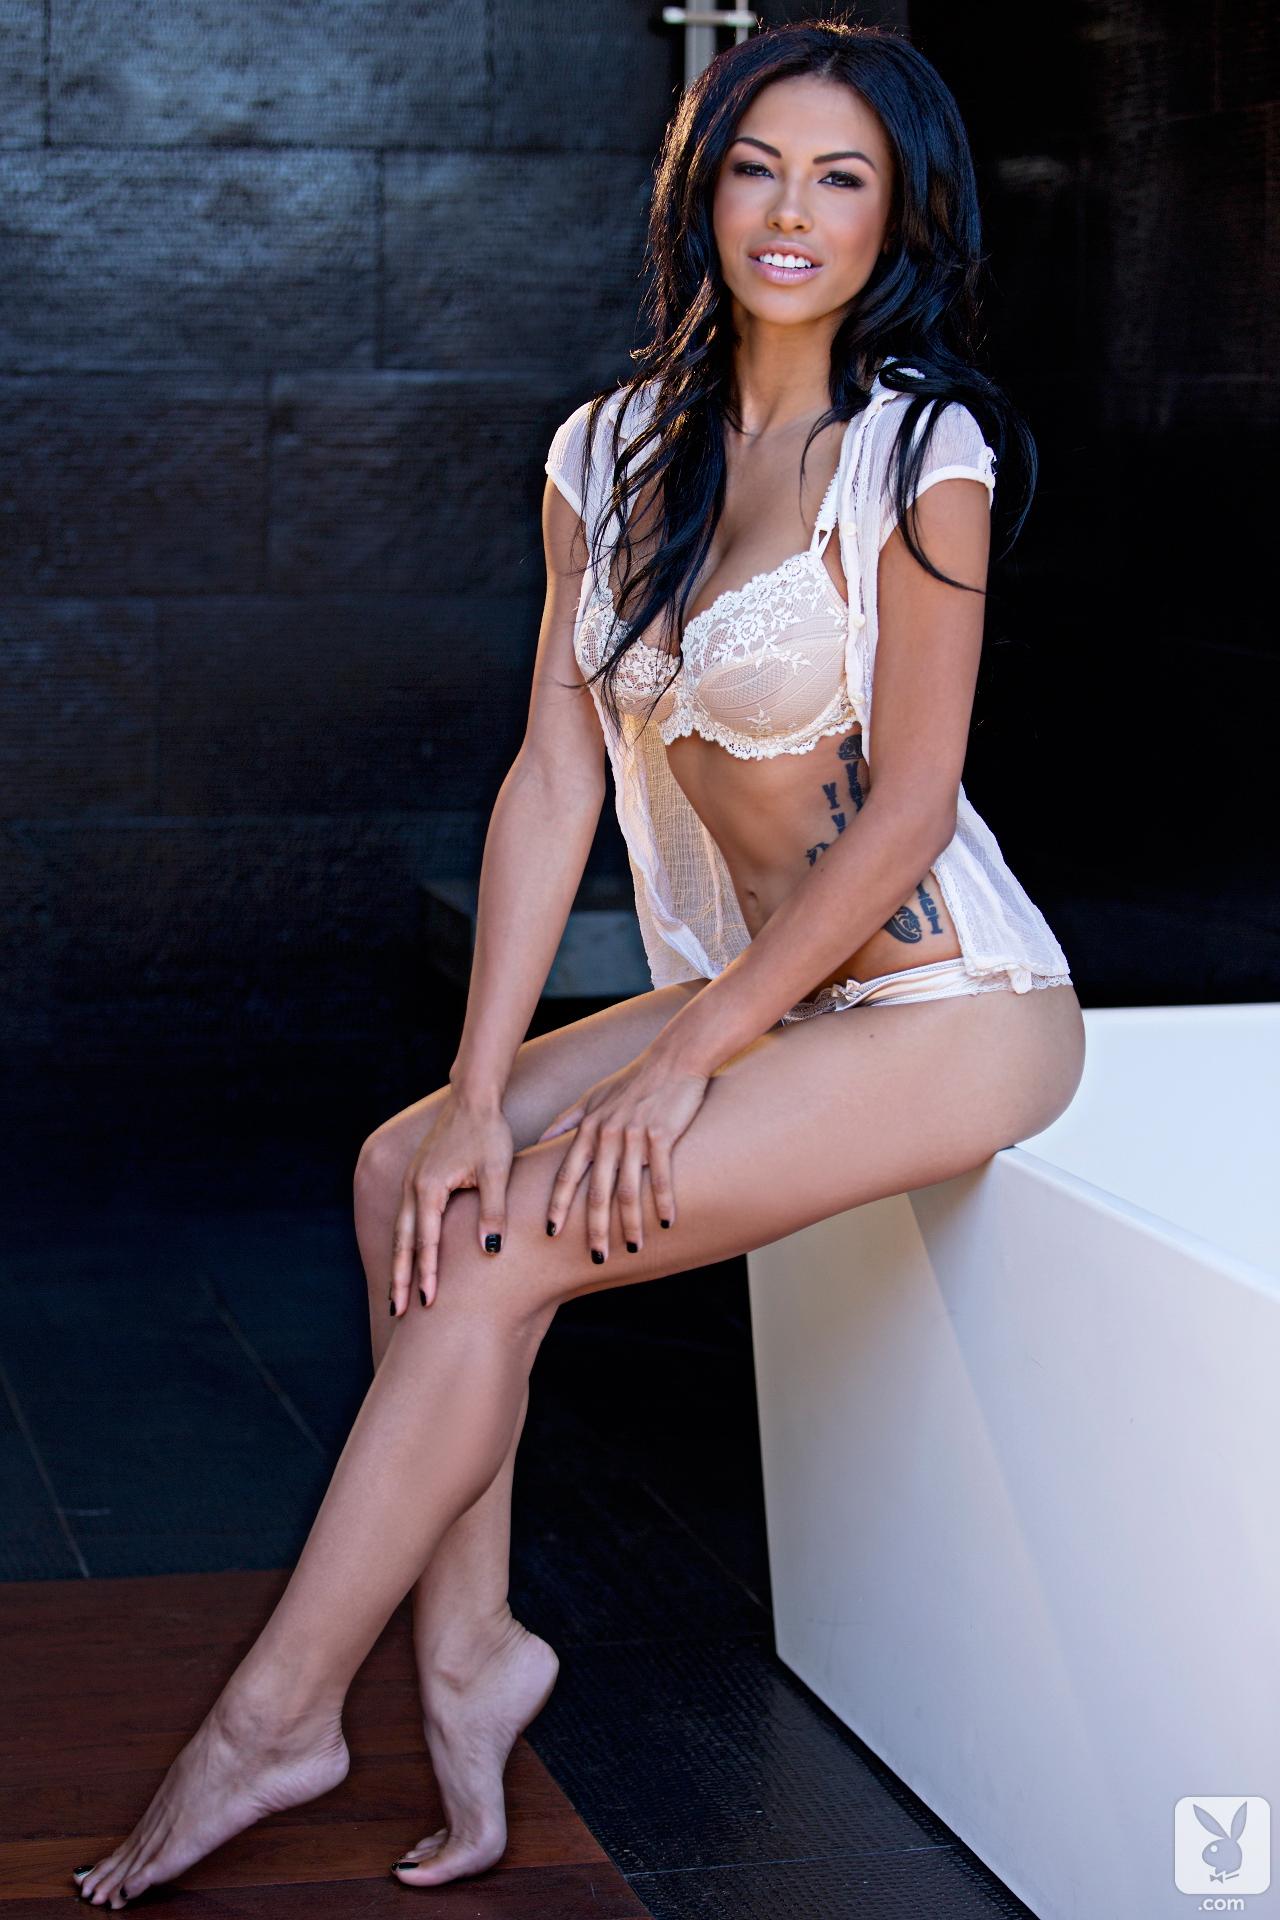 kylie-johnson-brunette-nude-bathroom-playboy-01